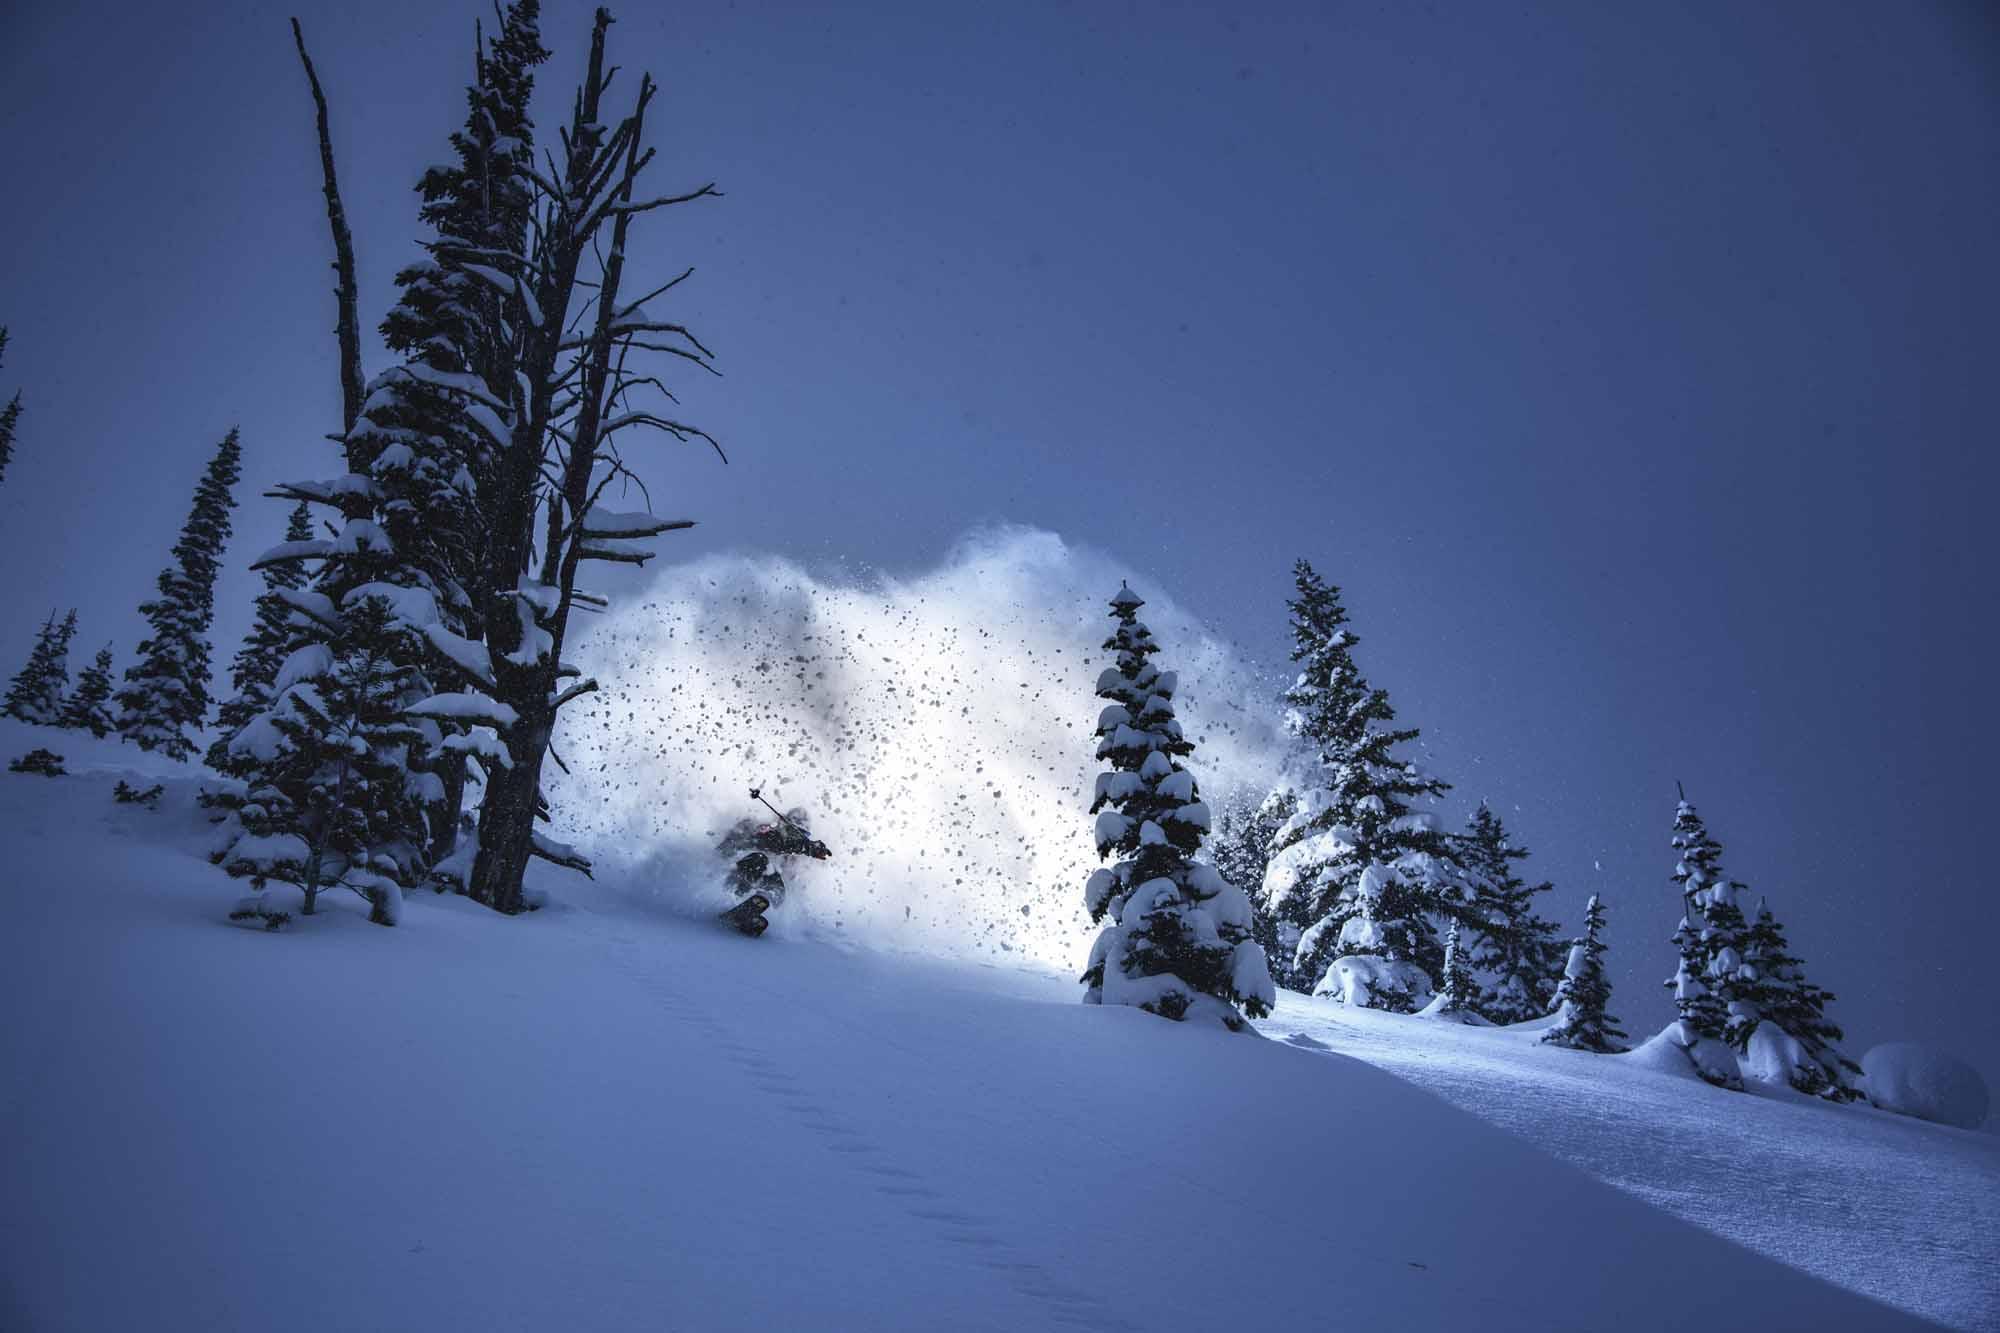 ML-Coast-Mountains-Winter-Spring-21-Issue-Out-Now-Sammy-Carlson-athlete-photo-by-Daniel-Stewart